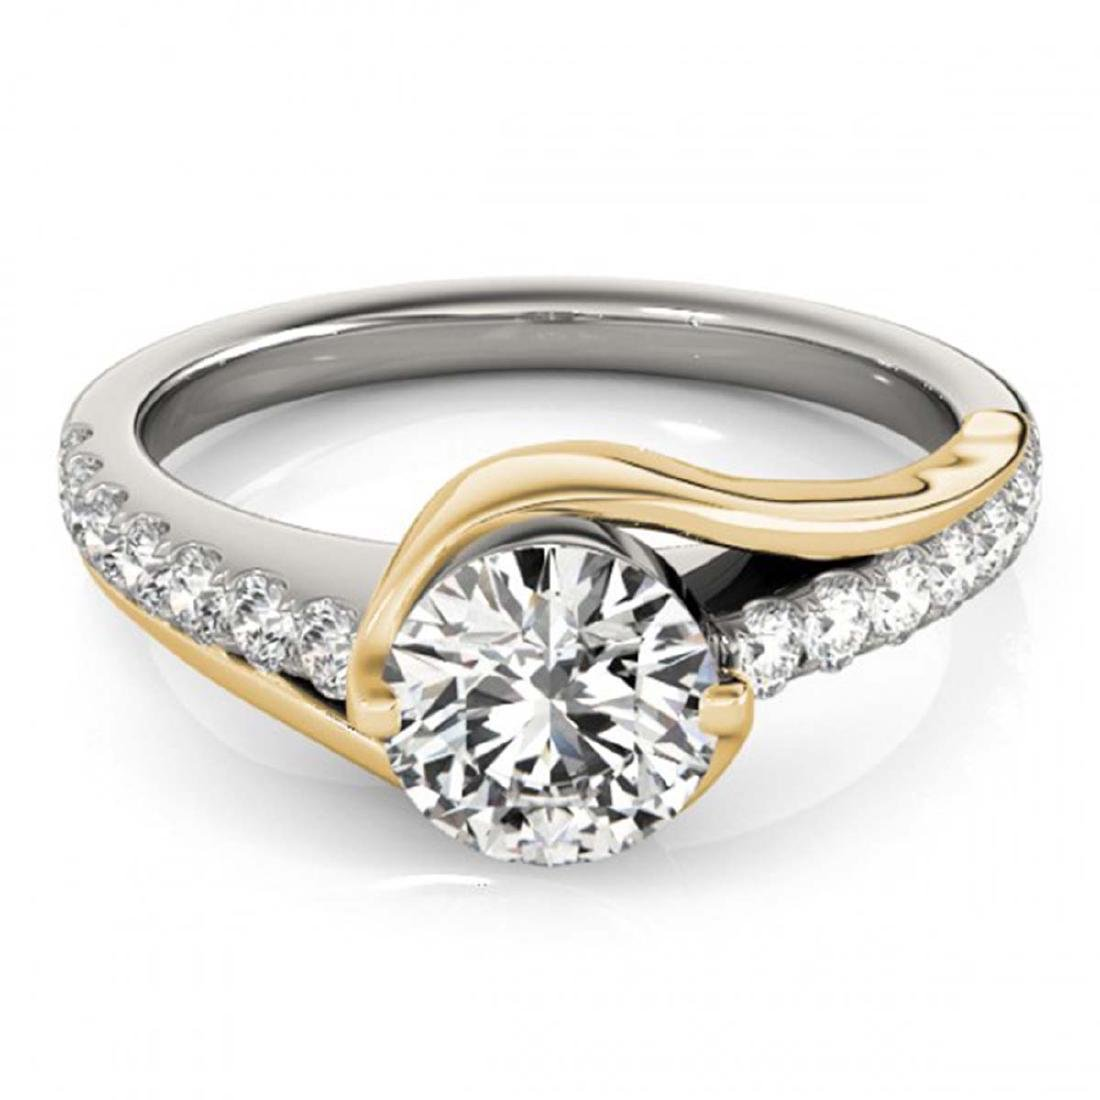 1.25 ctw VS/SI Diamond Solitaire Ring 14K White &